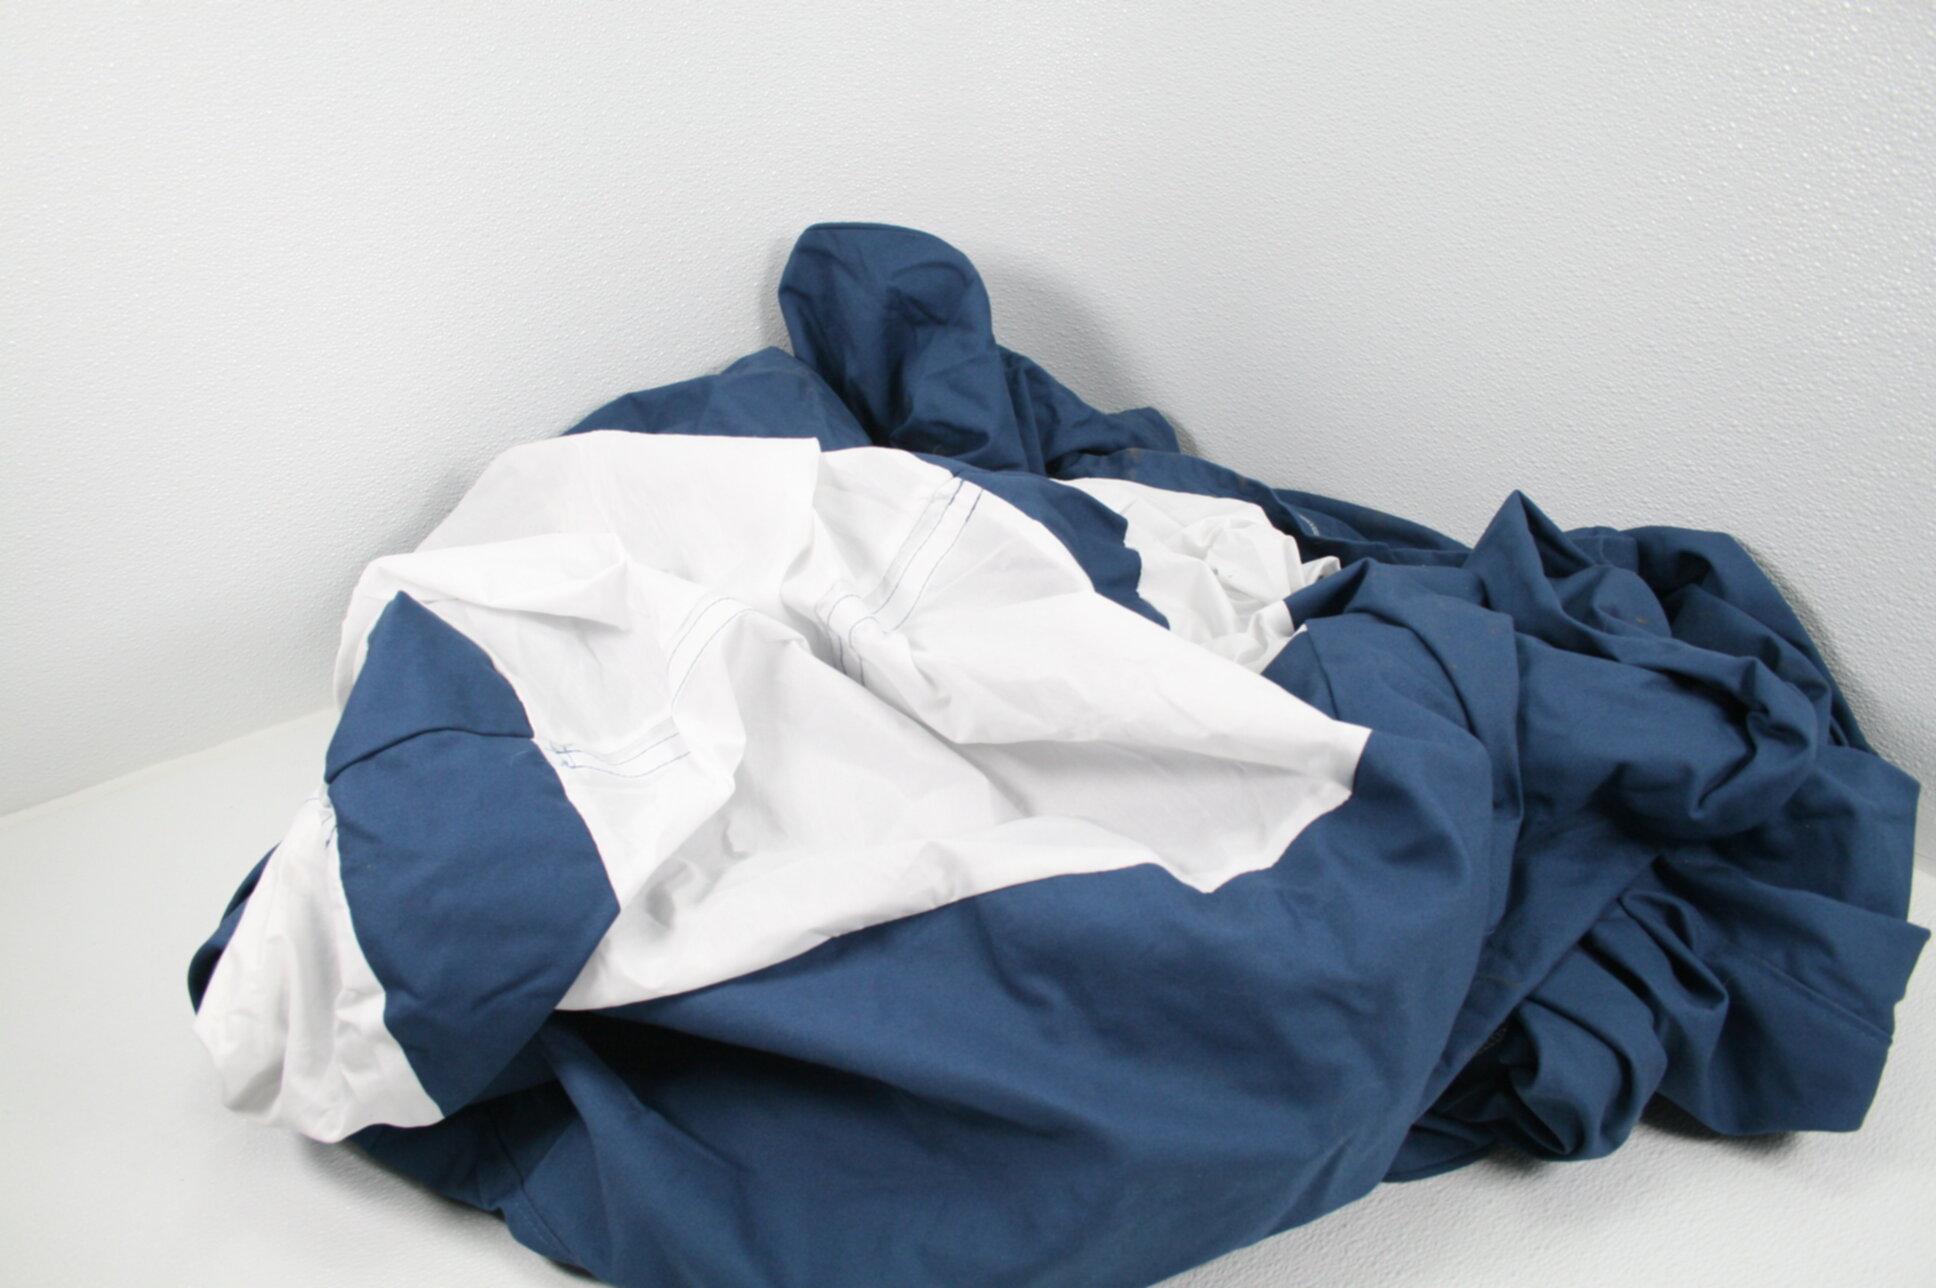 Last fall we bought an ikea ektorp sofa. The Thick Cotton IKEA Ektorp 2 Sofa Cover Replacement ...